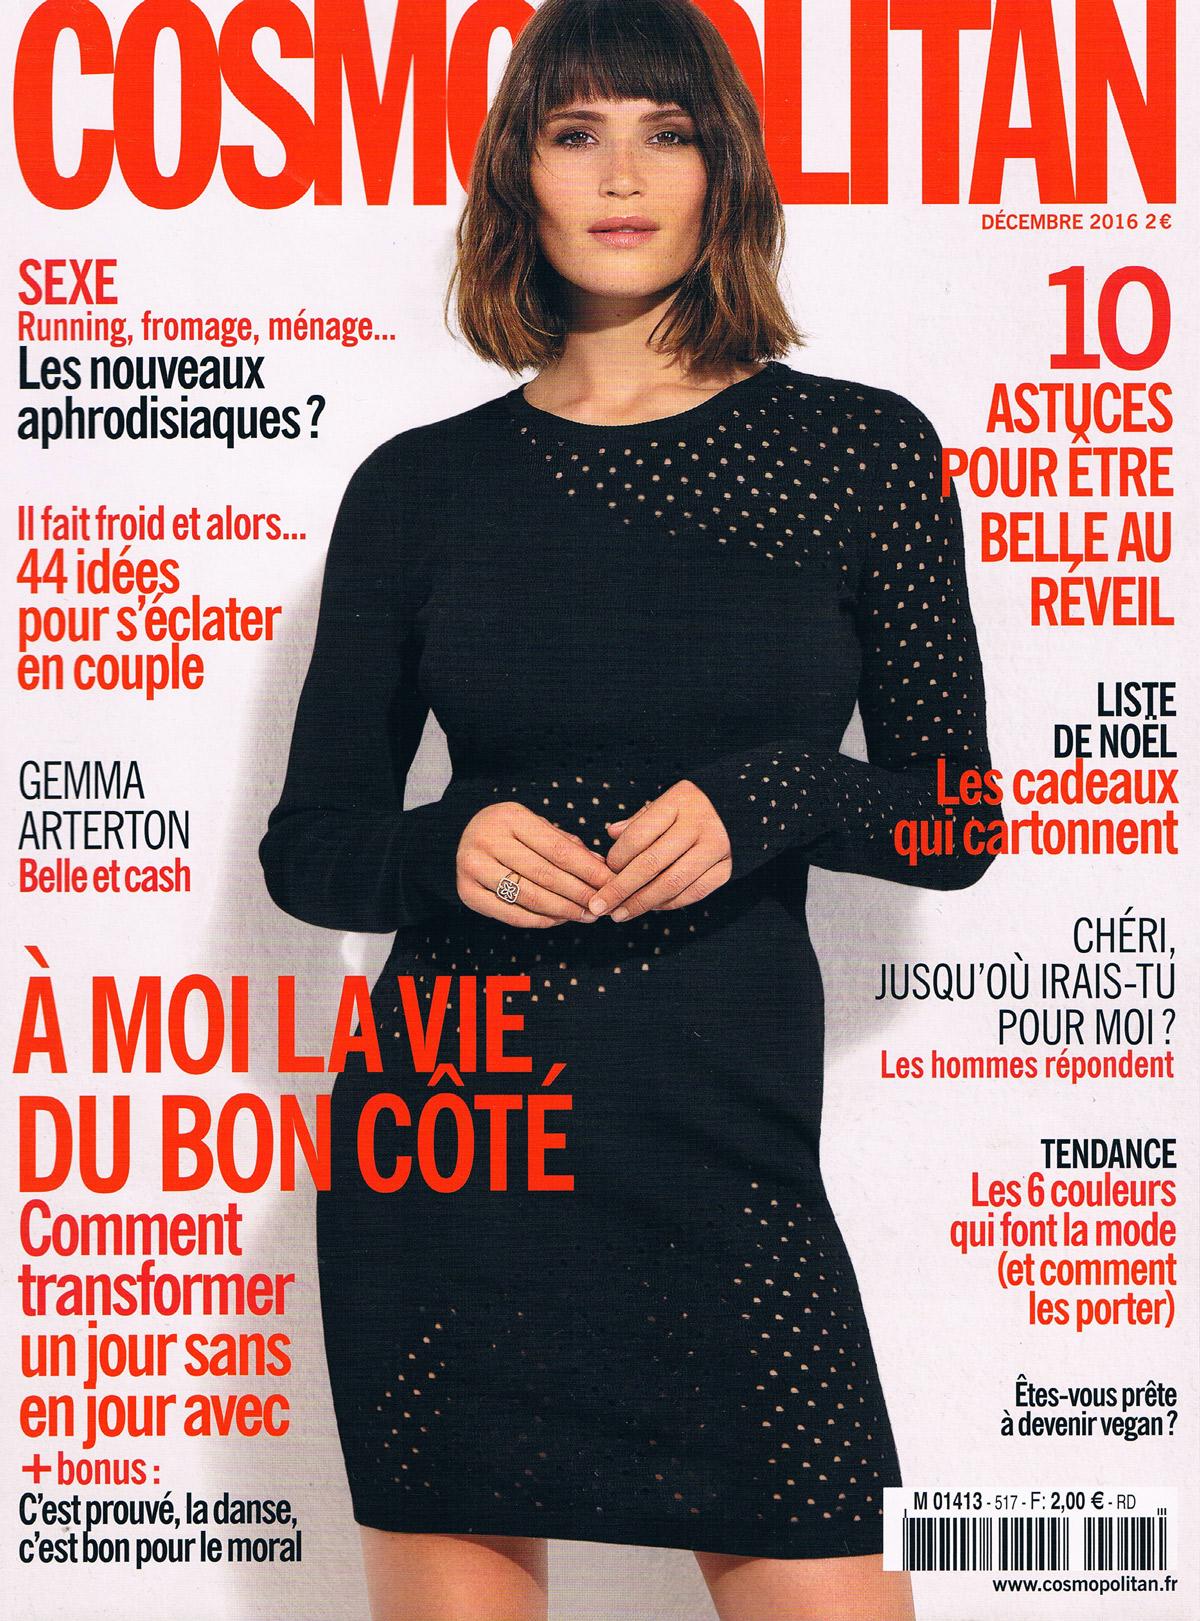 Cosmopolitan Décembre 2016